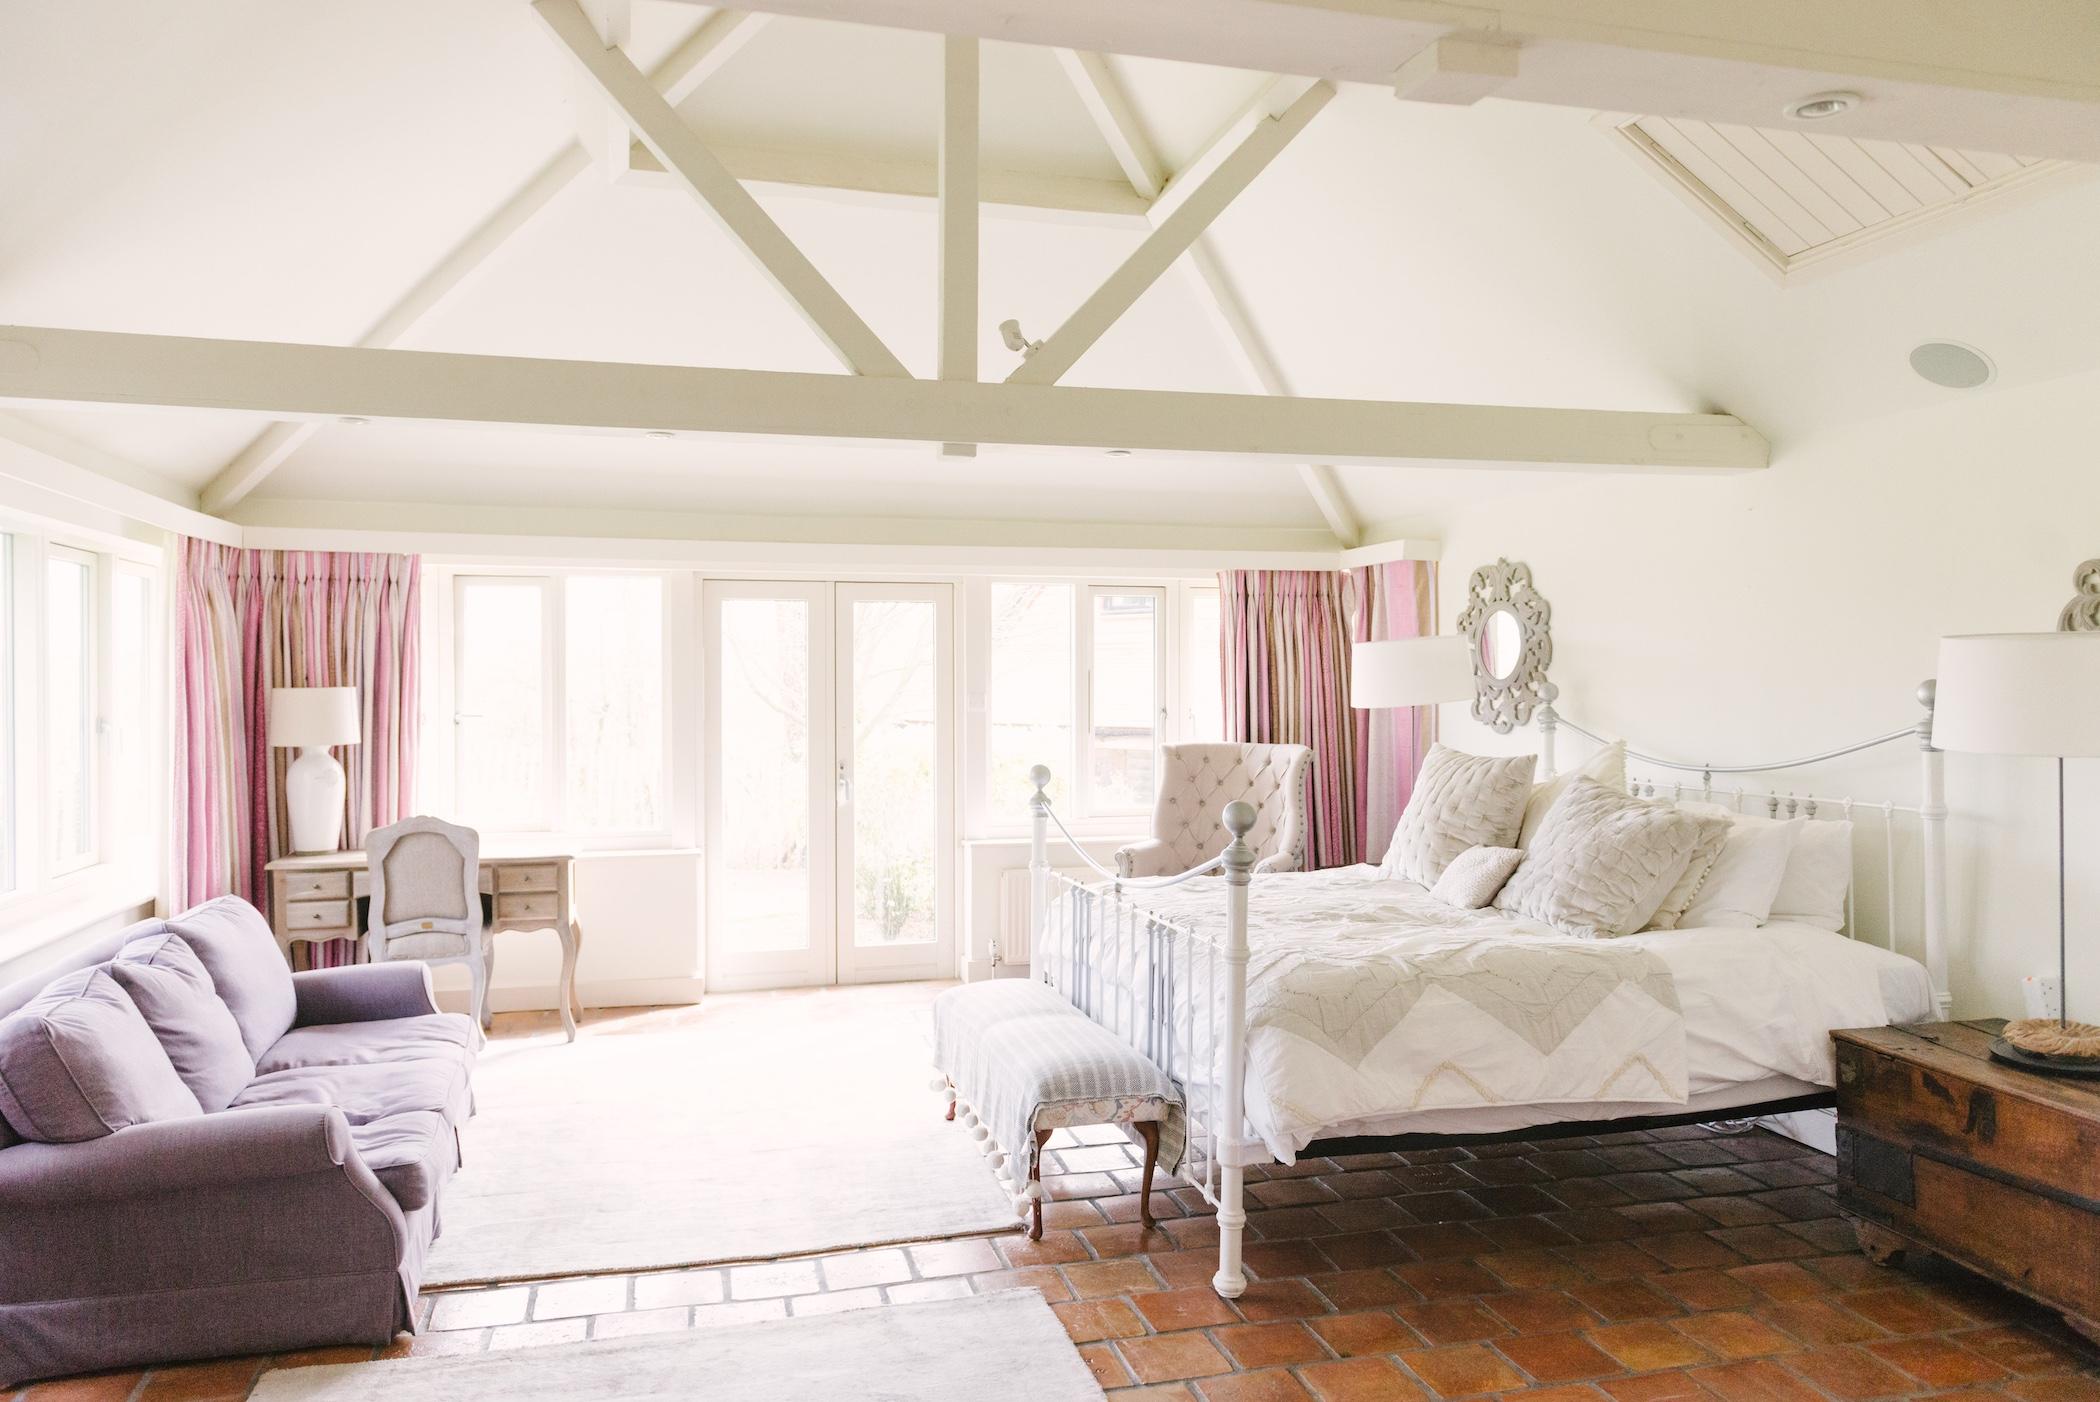 The Copse bedroom - Hannah Duffy Photography 2100x1400.jpg